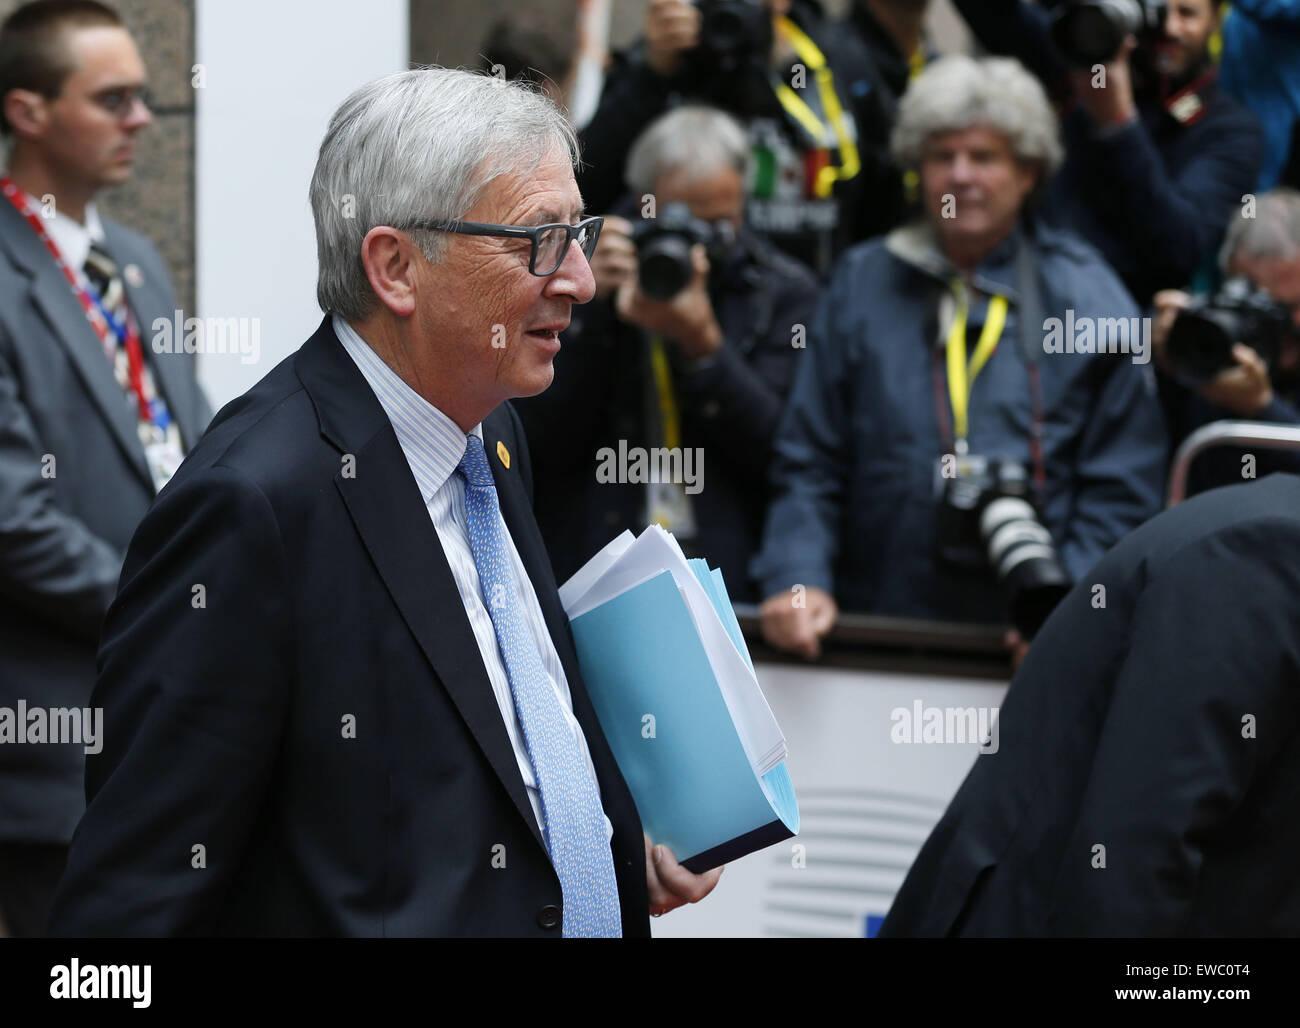 Brussels, Belgium. 22nd June, 2015. European Commission President Jean-Claude Juncker walks out of the European Stock Photo